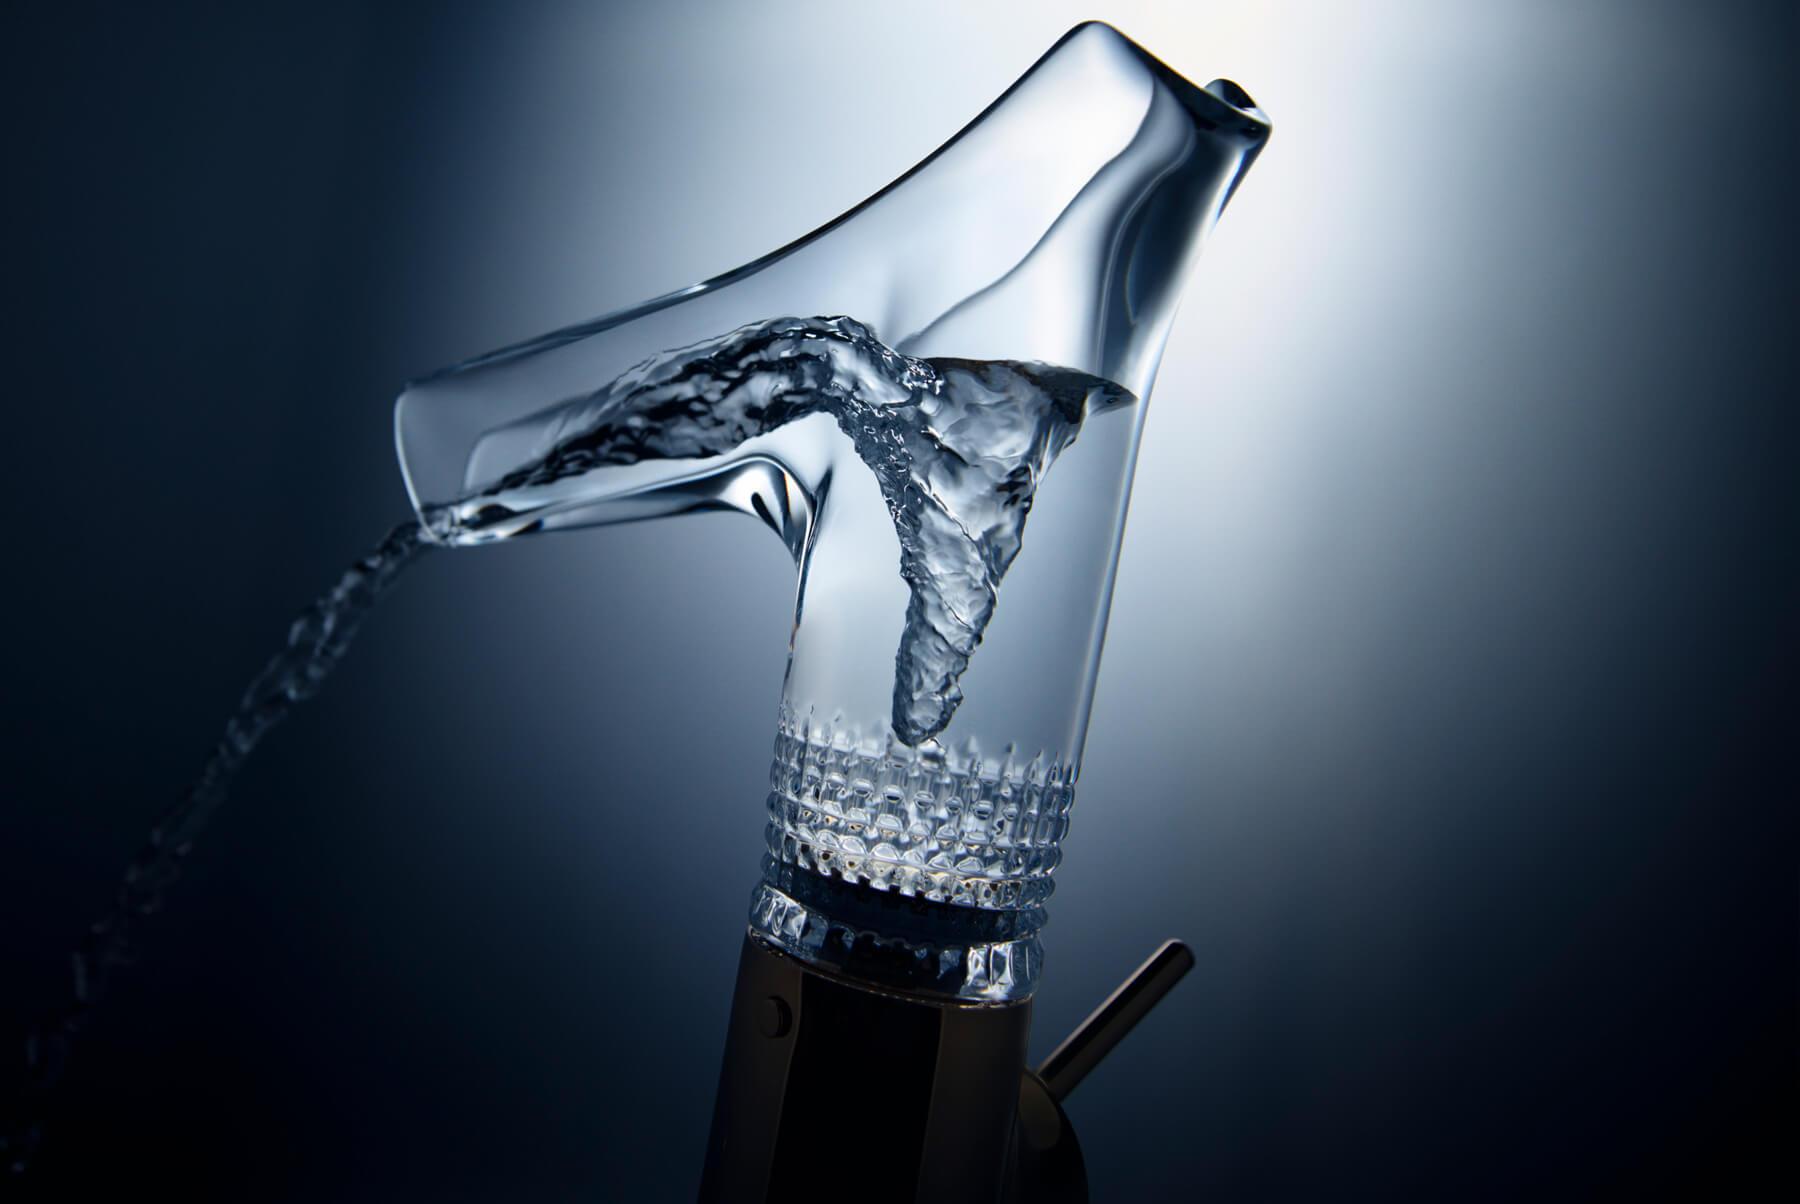 Brassware-AXOR-STARK-V-Inset-5-1800x1204